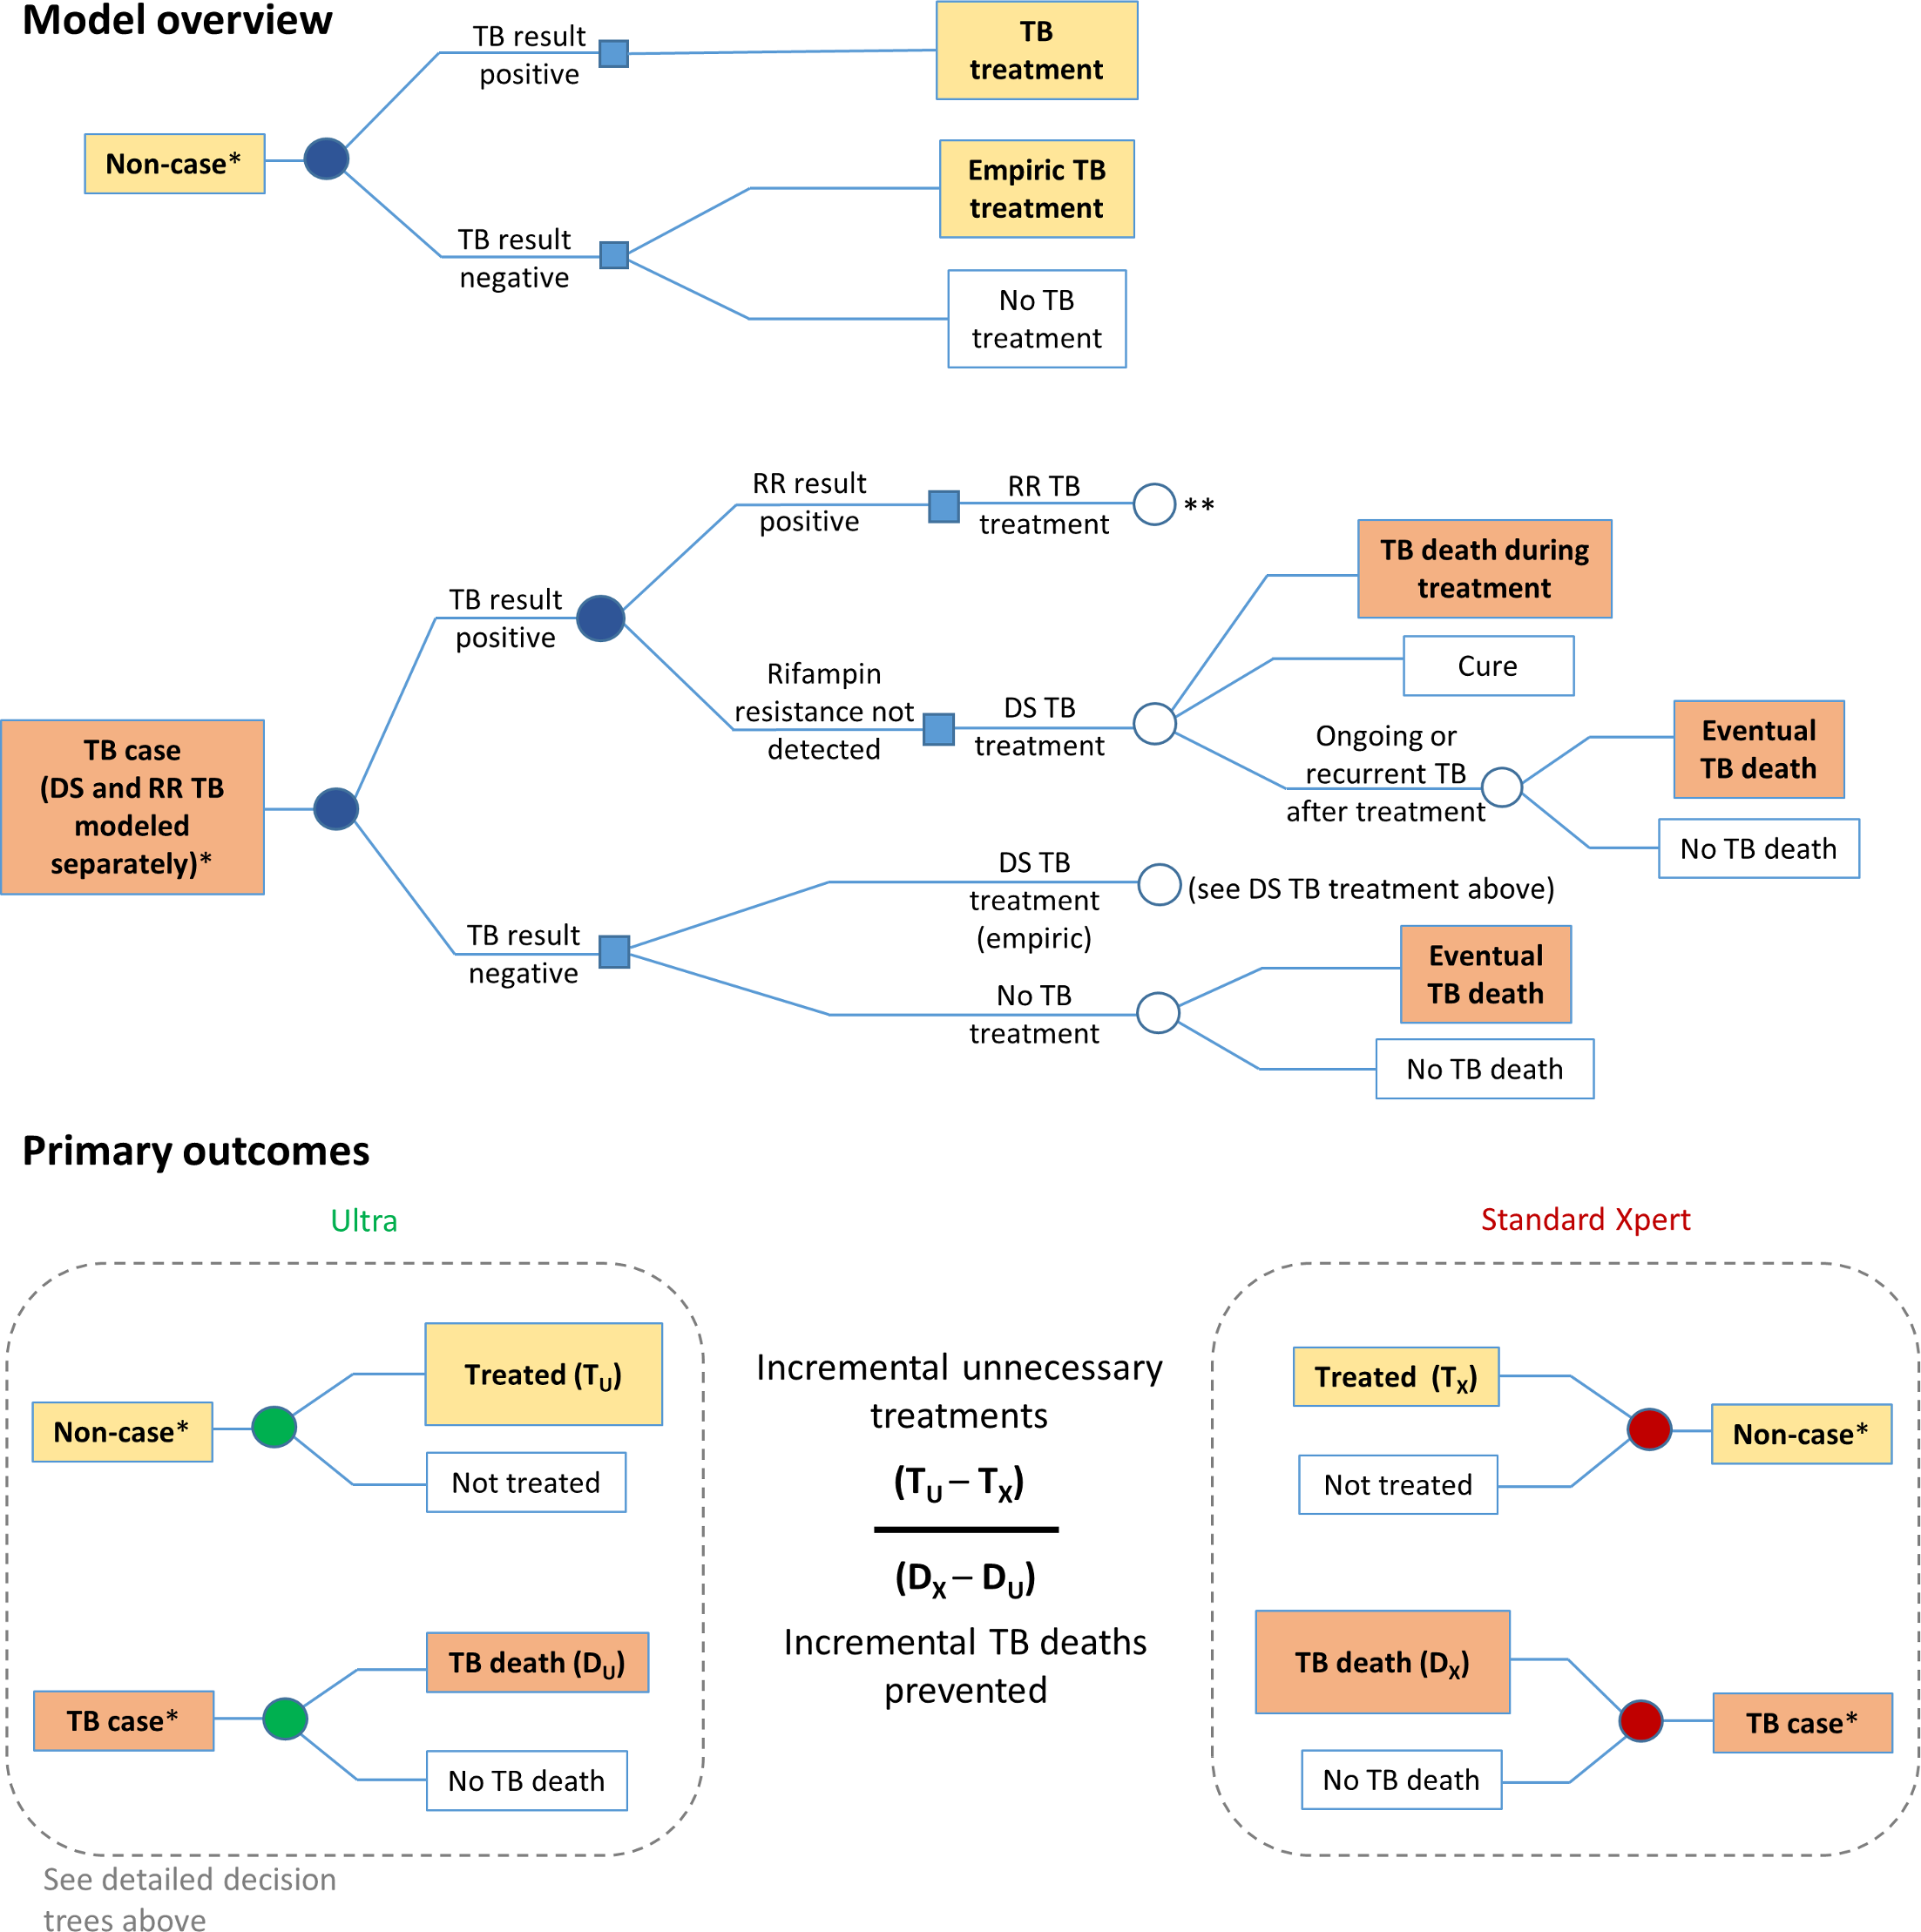 Markov model description.